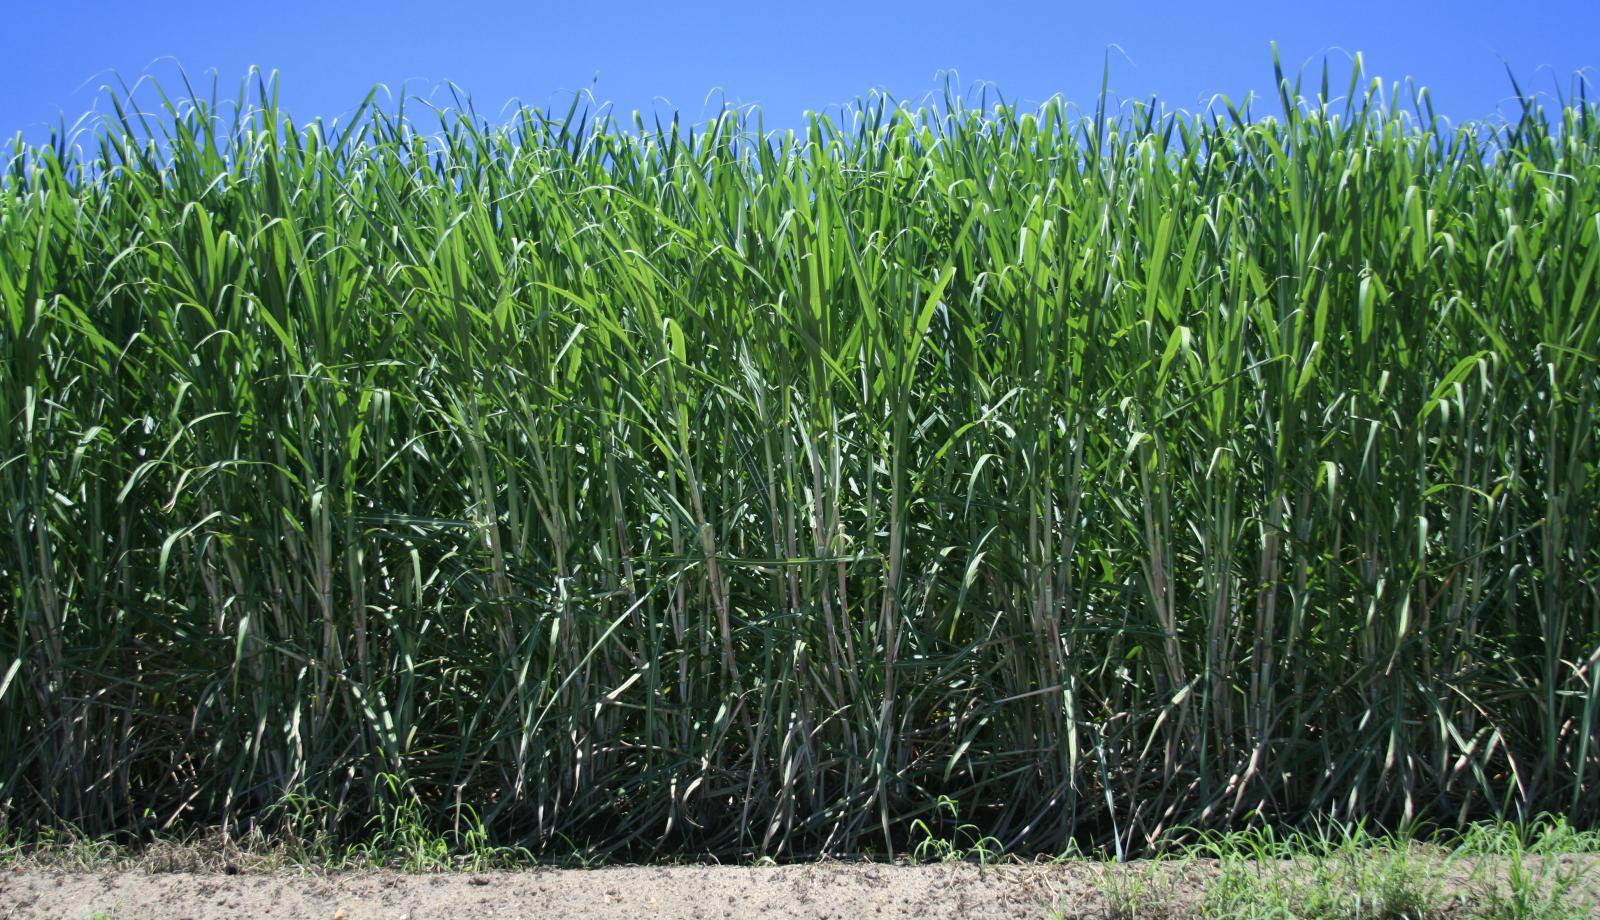 Senate support for sugar code